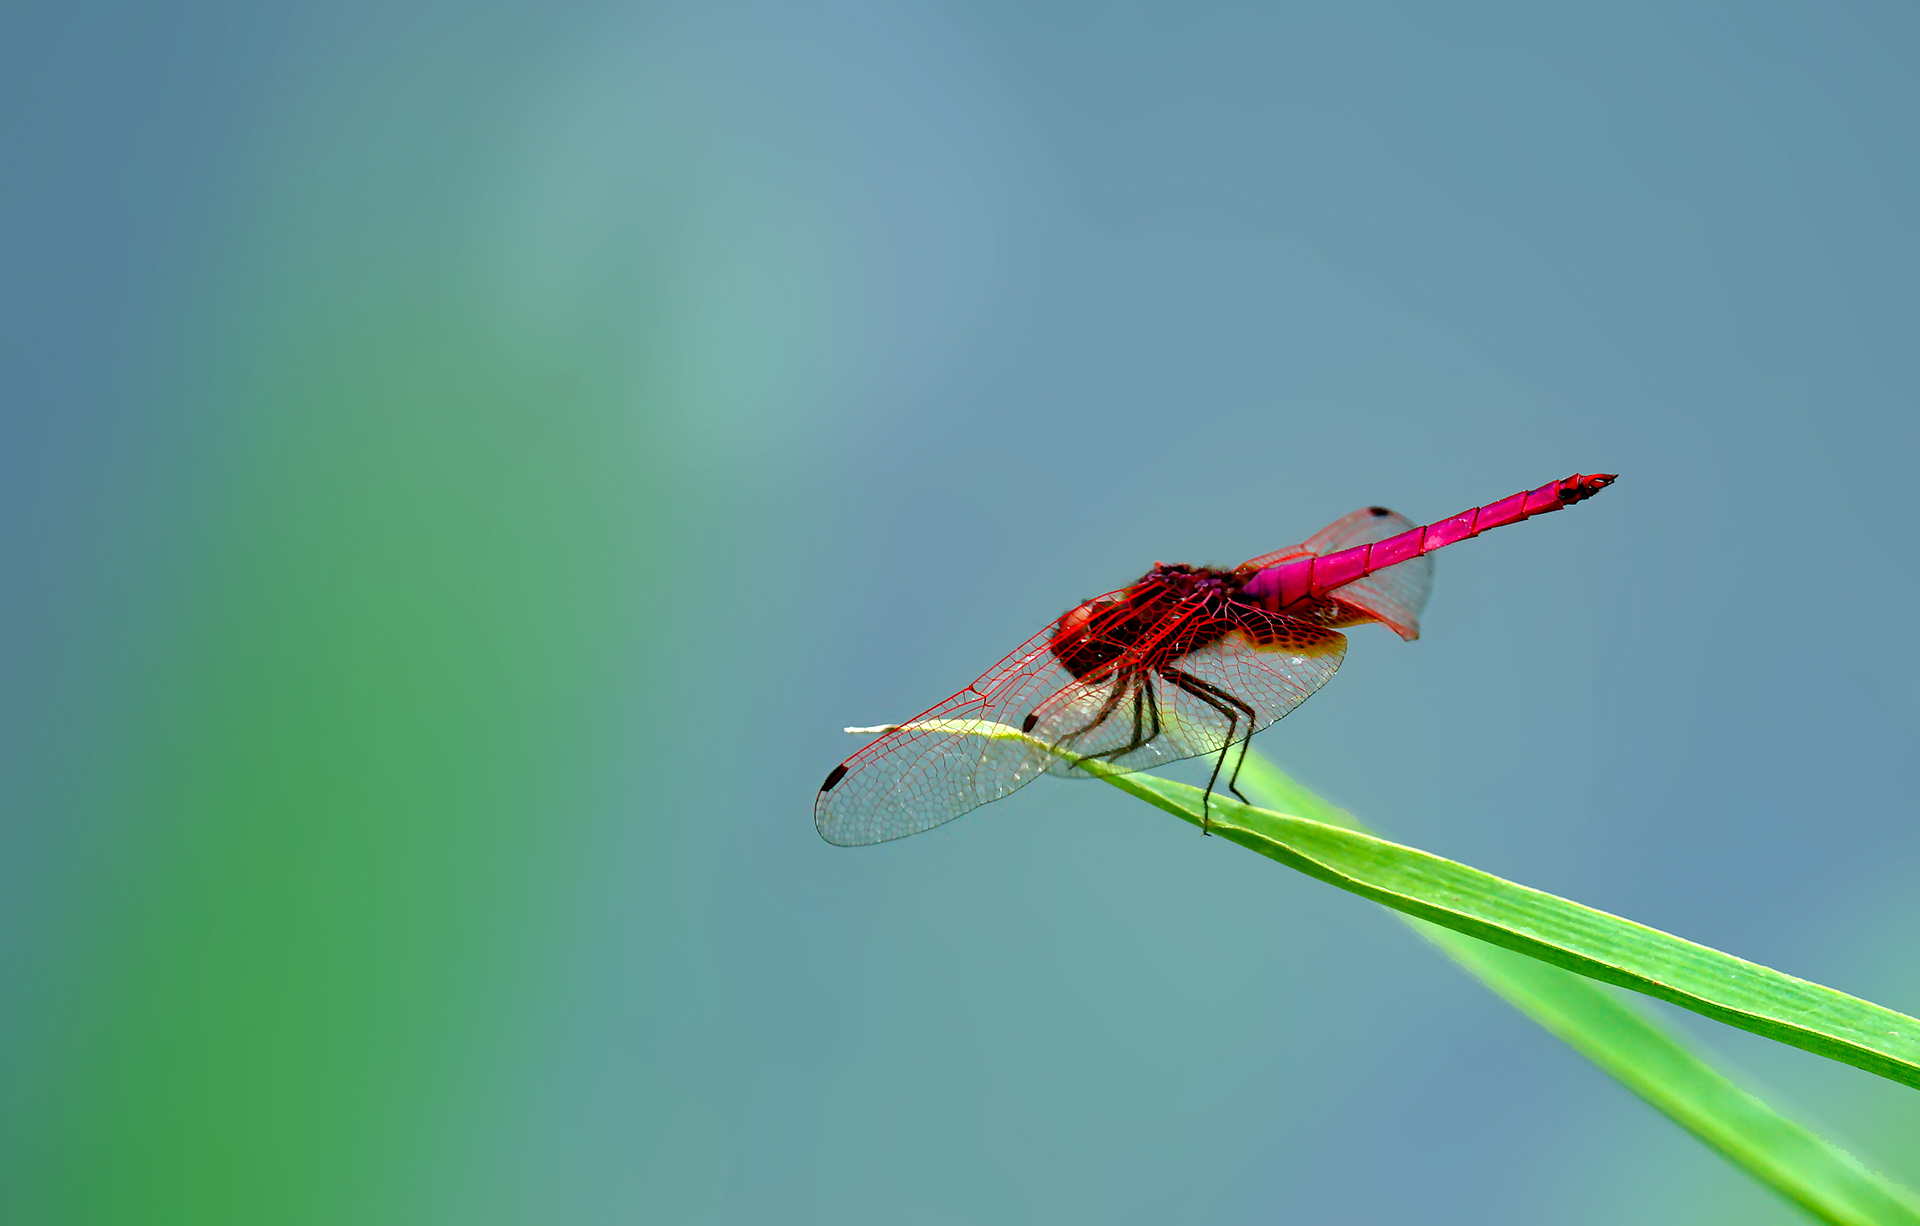 fjhutu作品:红蜻蜓